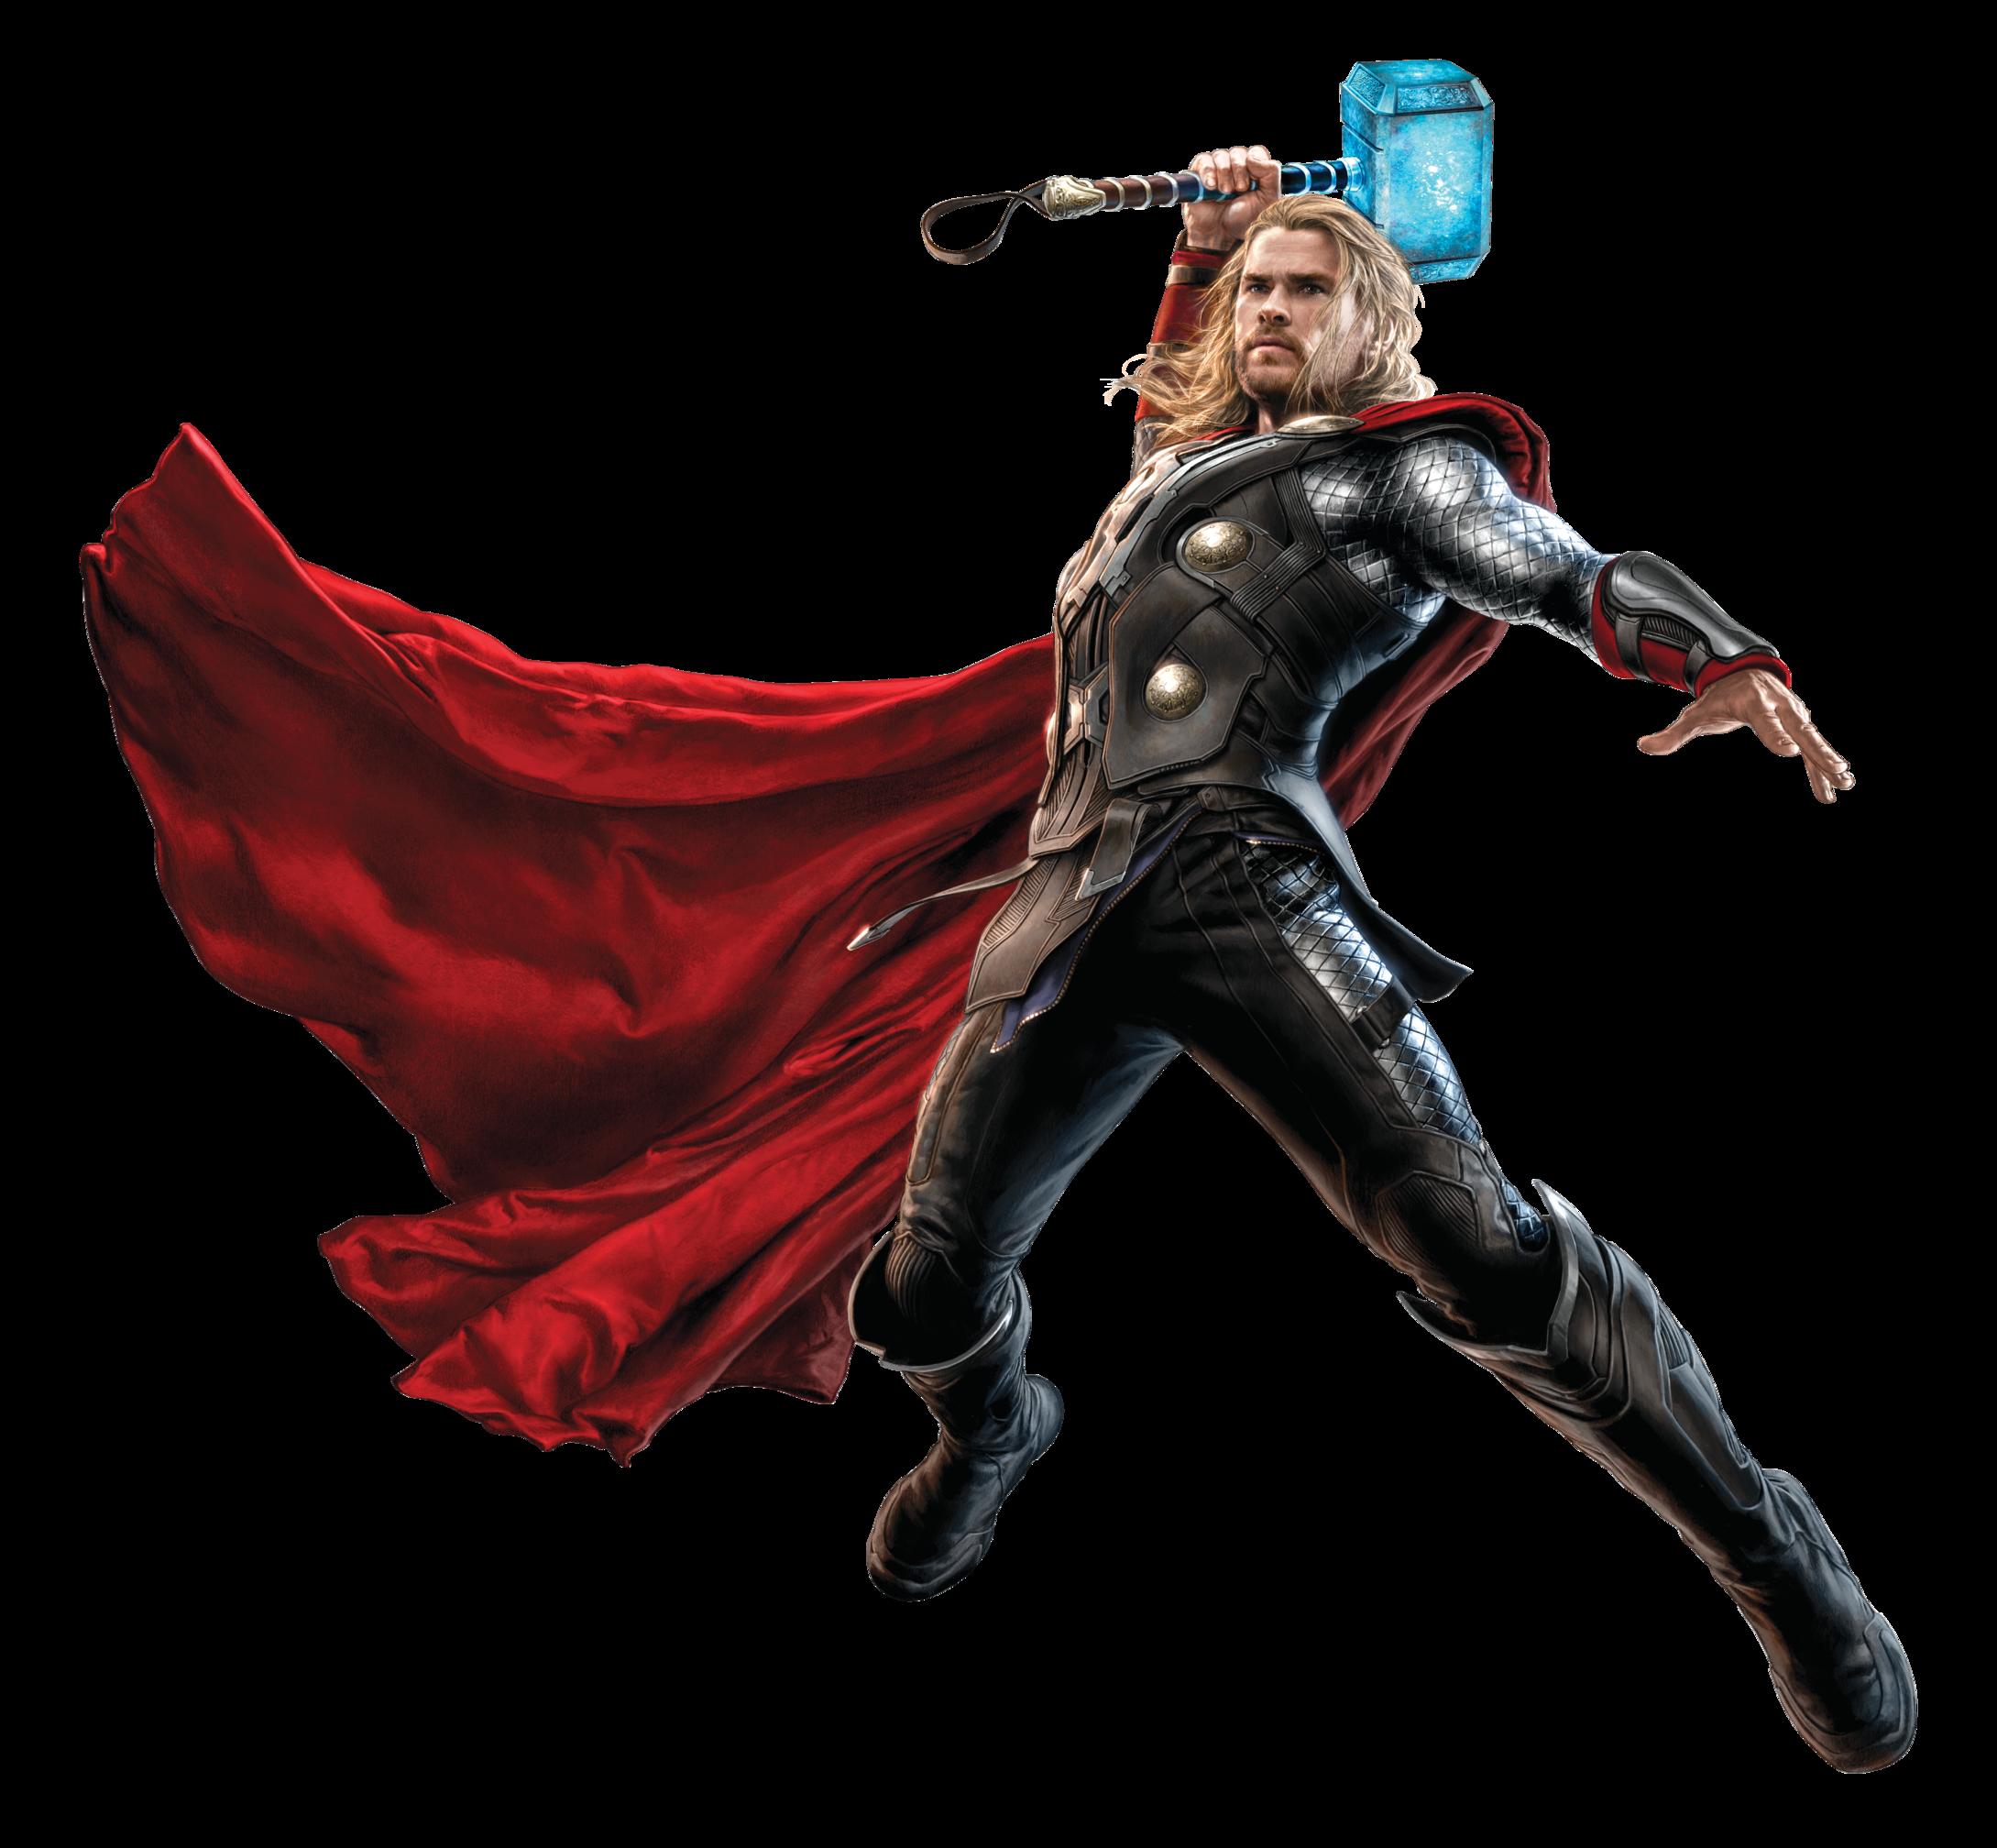 Thor Fighting With His Hammer Png Image Marvel Avengers Alliance Marvel Avengers Assemble Iron Man Art